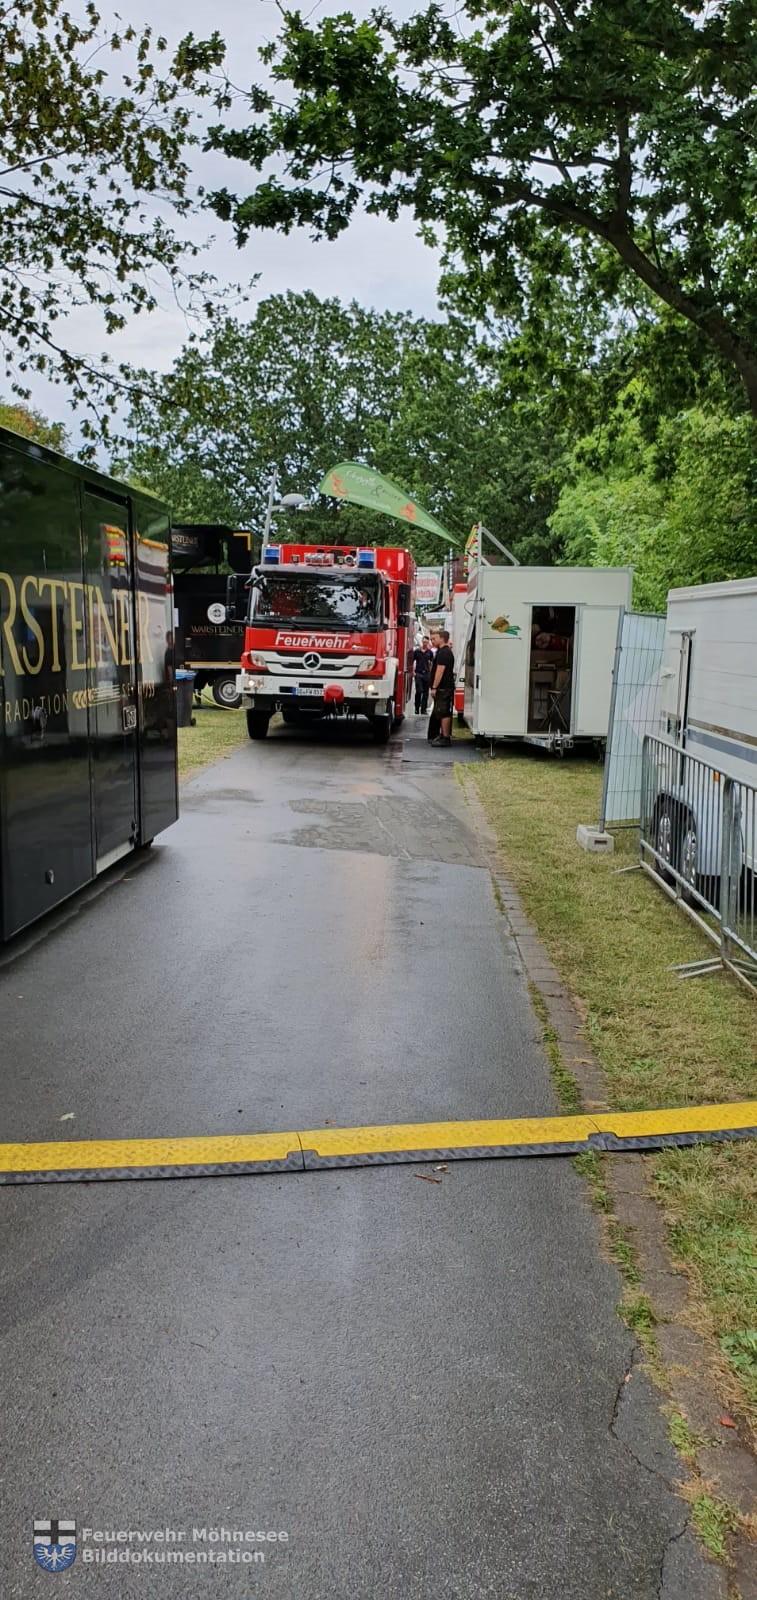 Brückenfest Möhnesee 2019